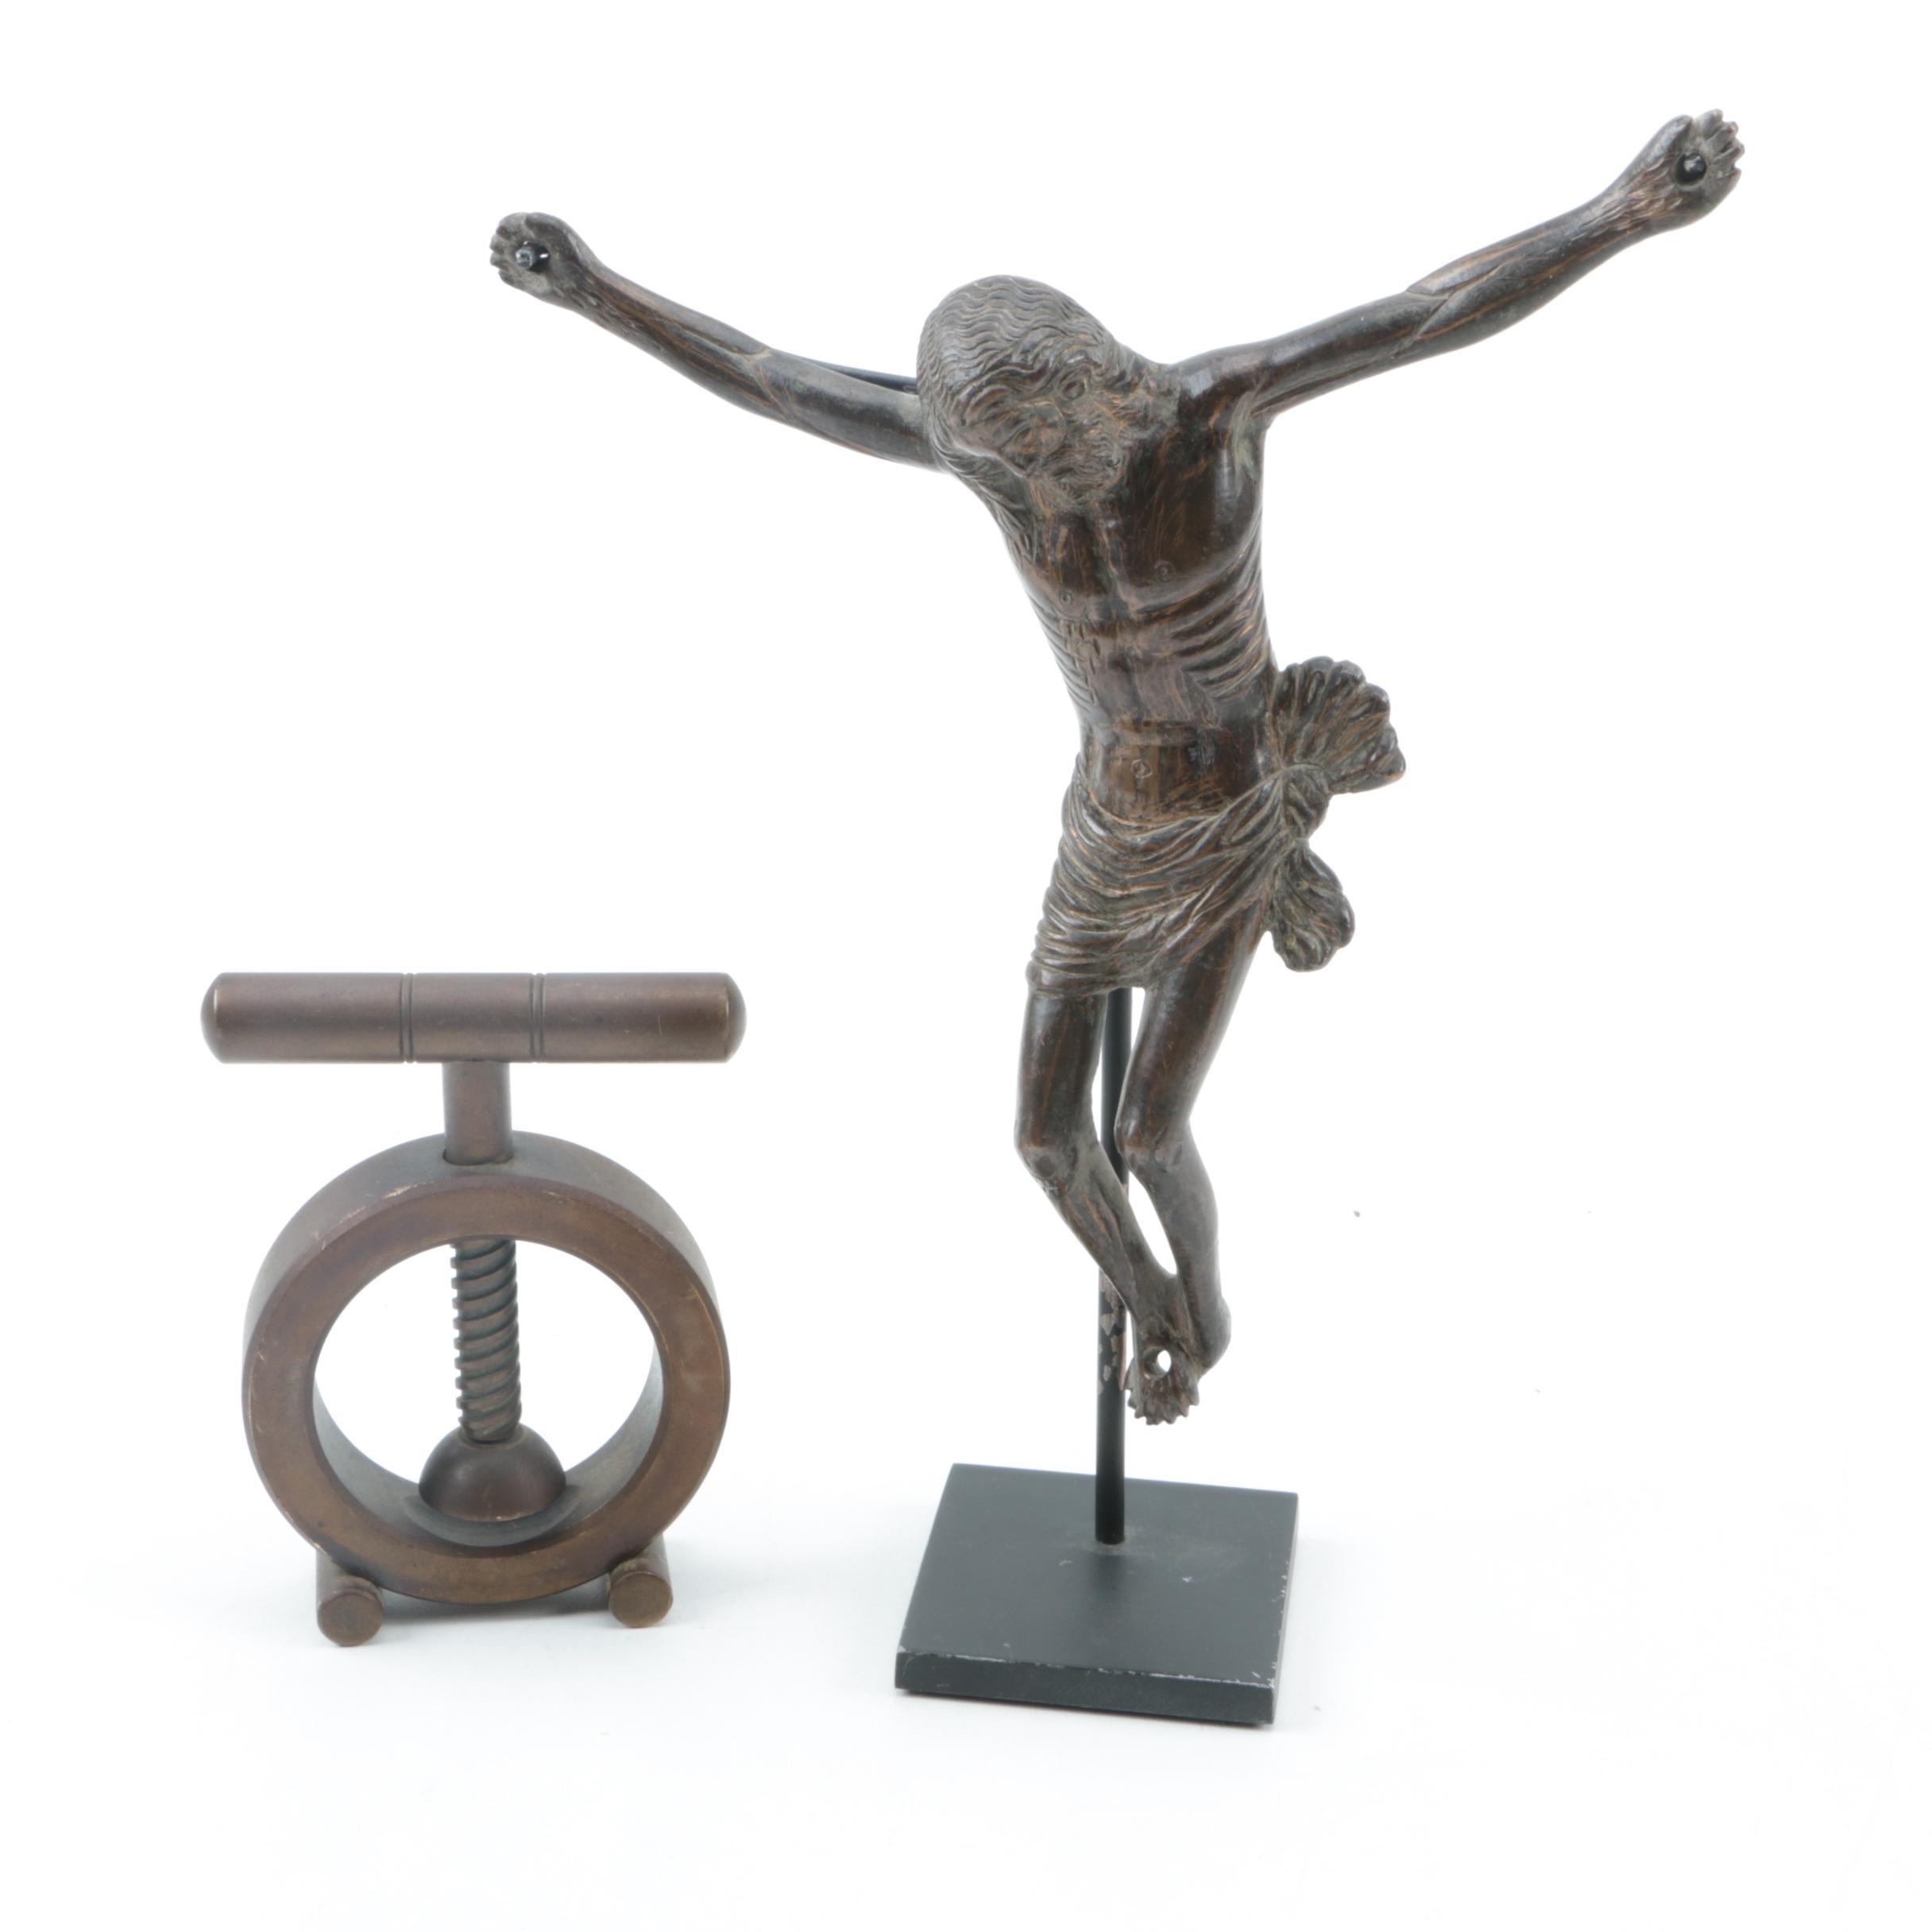 Metal Christ Figure and Art Deco Nutcracker